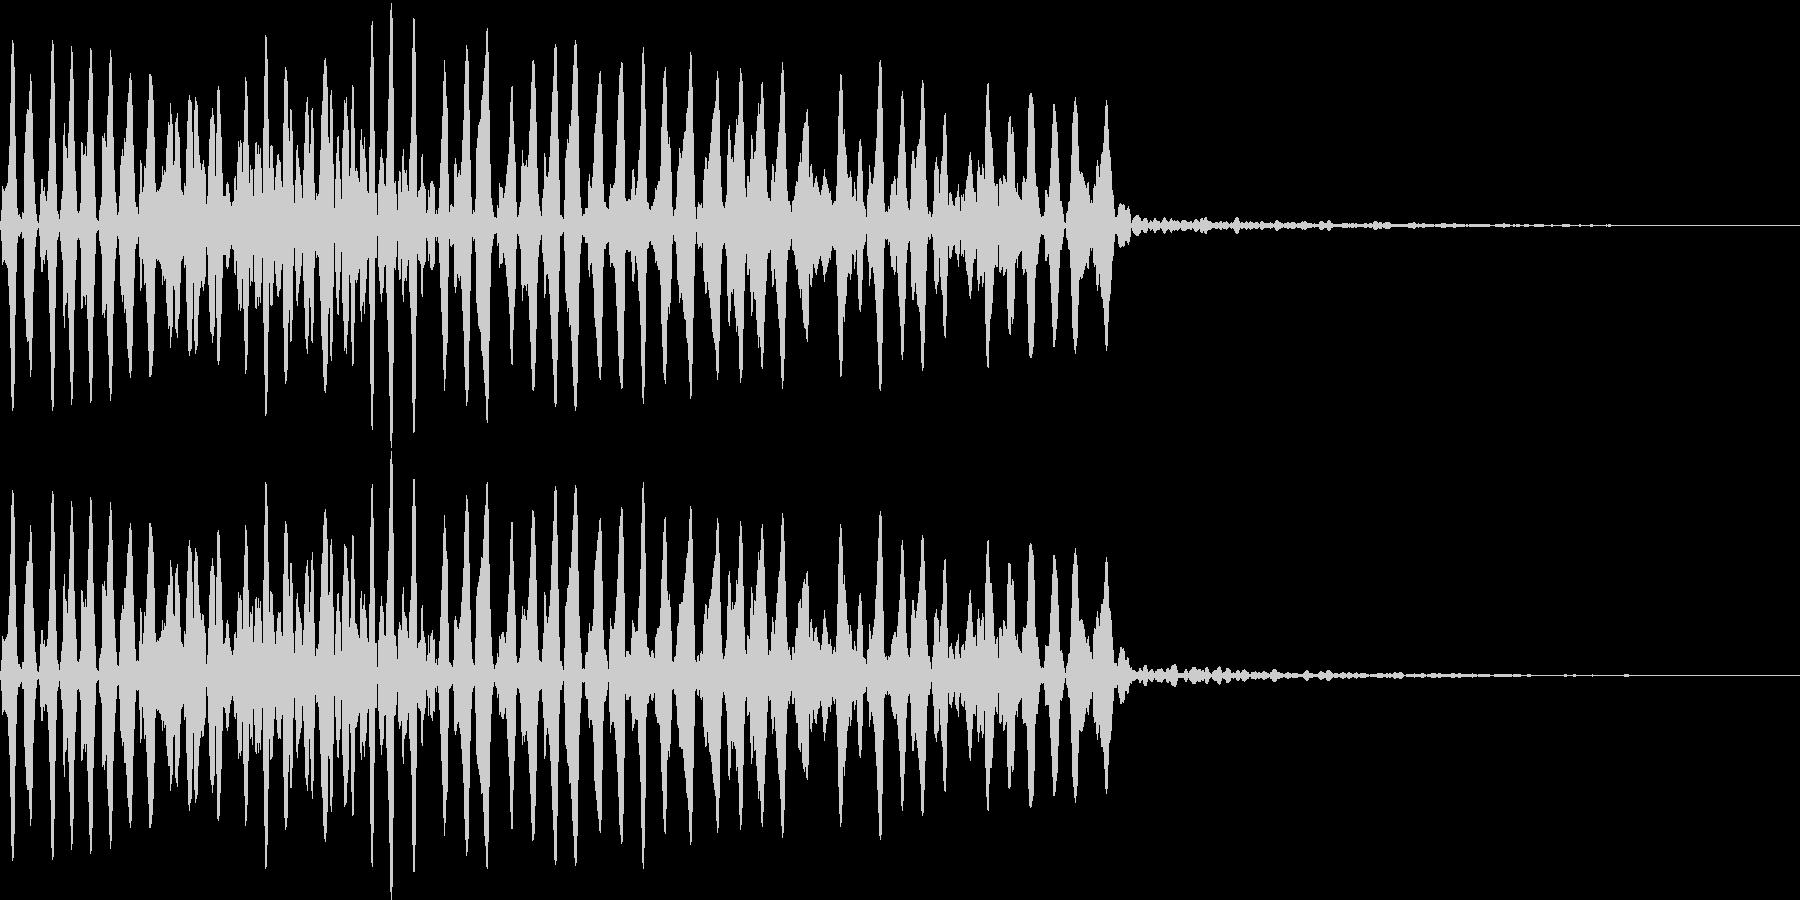 Animal 虫の鳴き声 教育・絵本にの未再生の波形